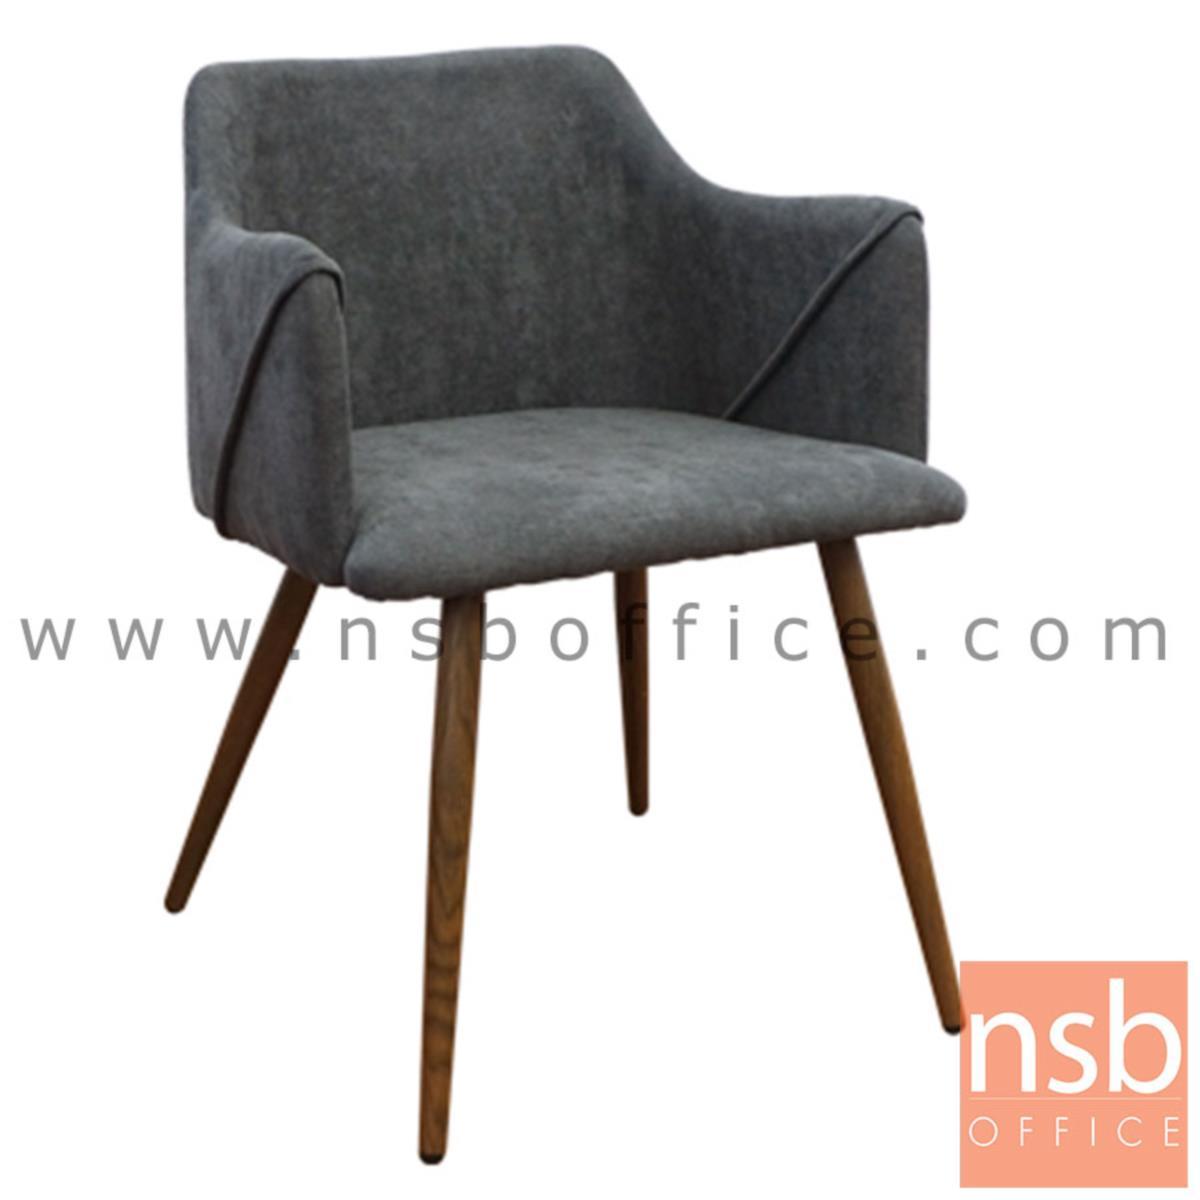 B29A356:เก้าอี้โมเดิร์นหุ้มผ้า รุ่น Florence (ฟลอเรนซ์)  ขาไม้